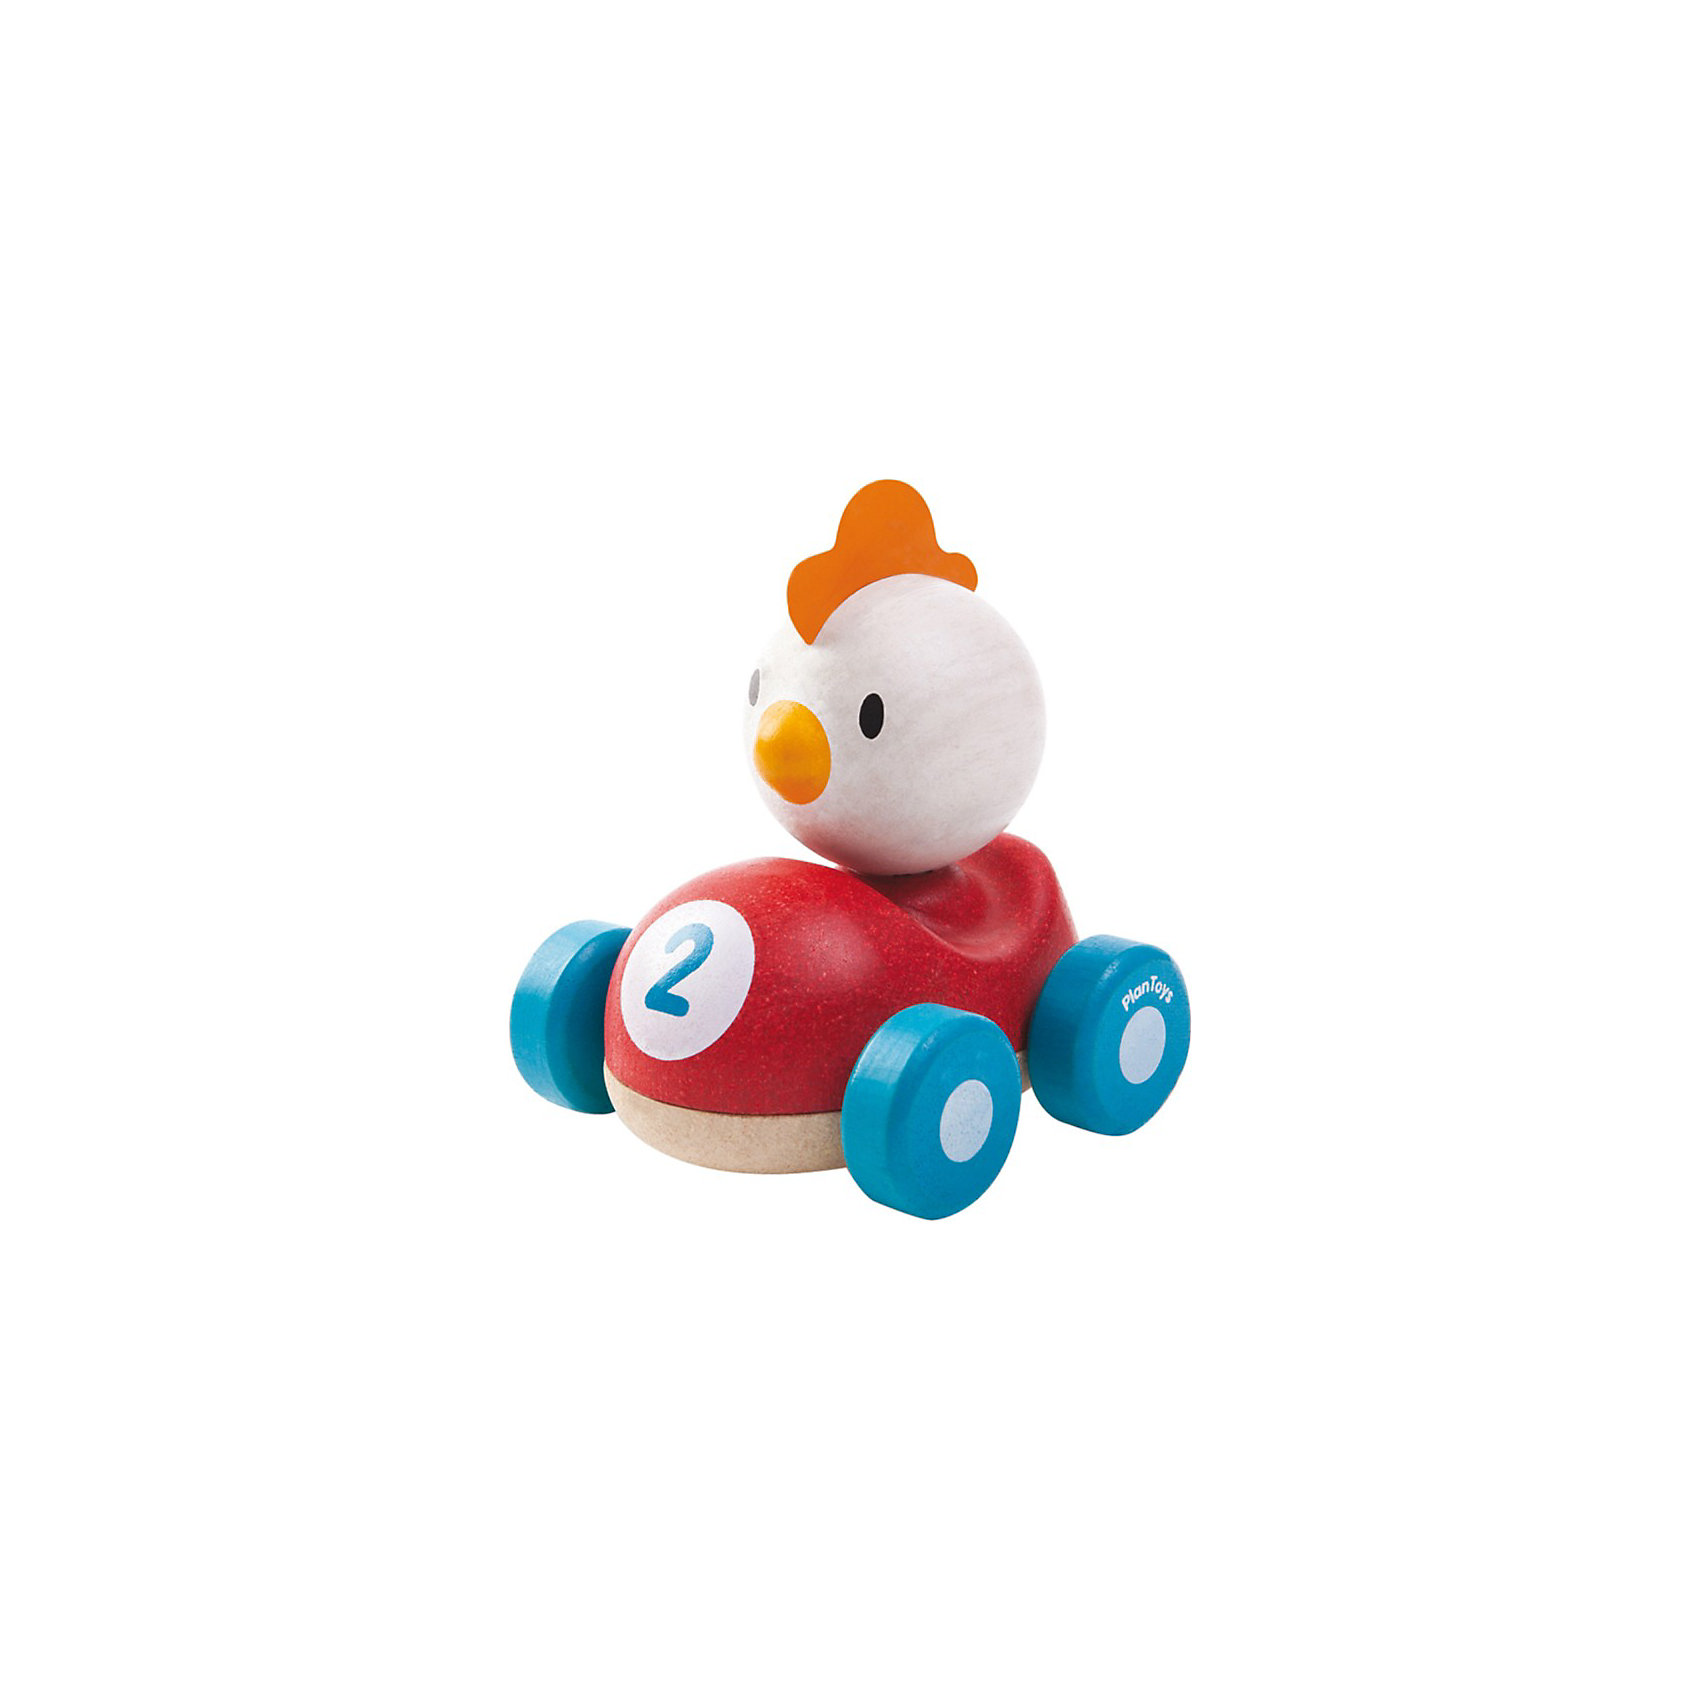 Plan Toys Курочка, Plan Toys конструкторы plan toys игра кактус